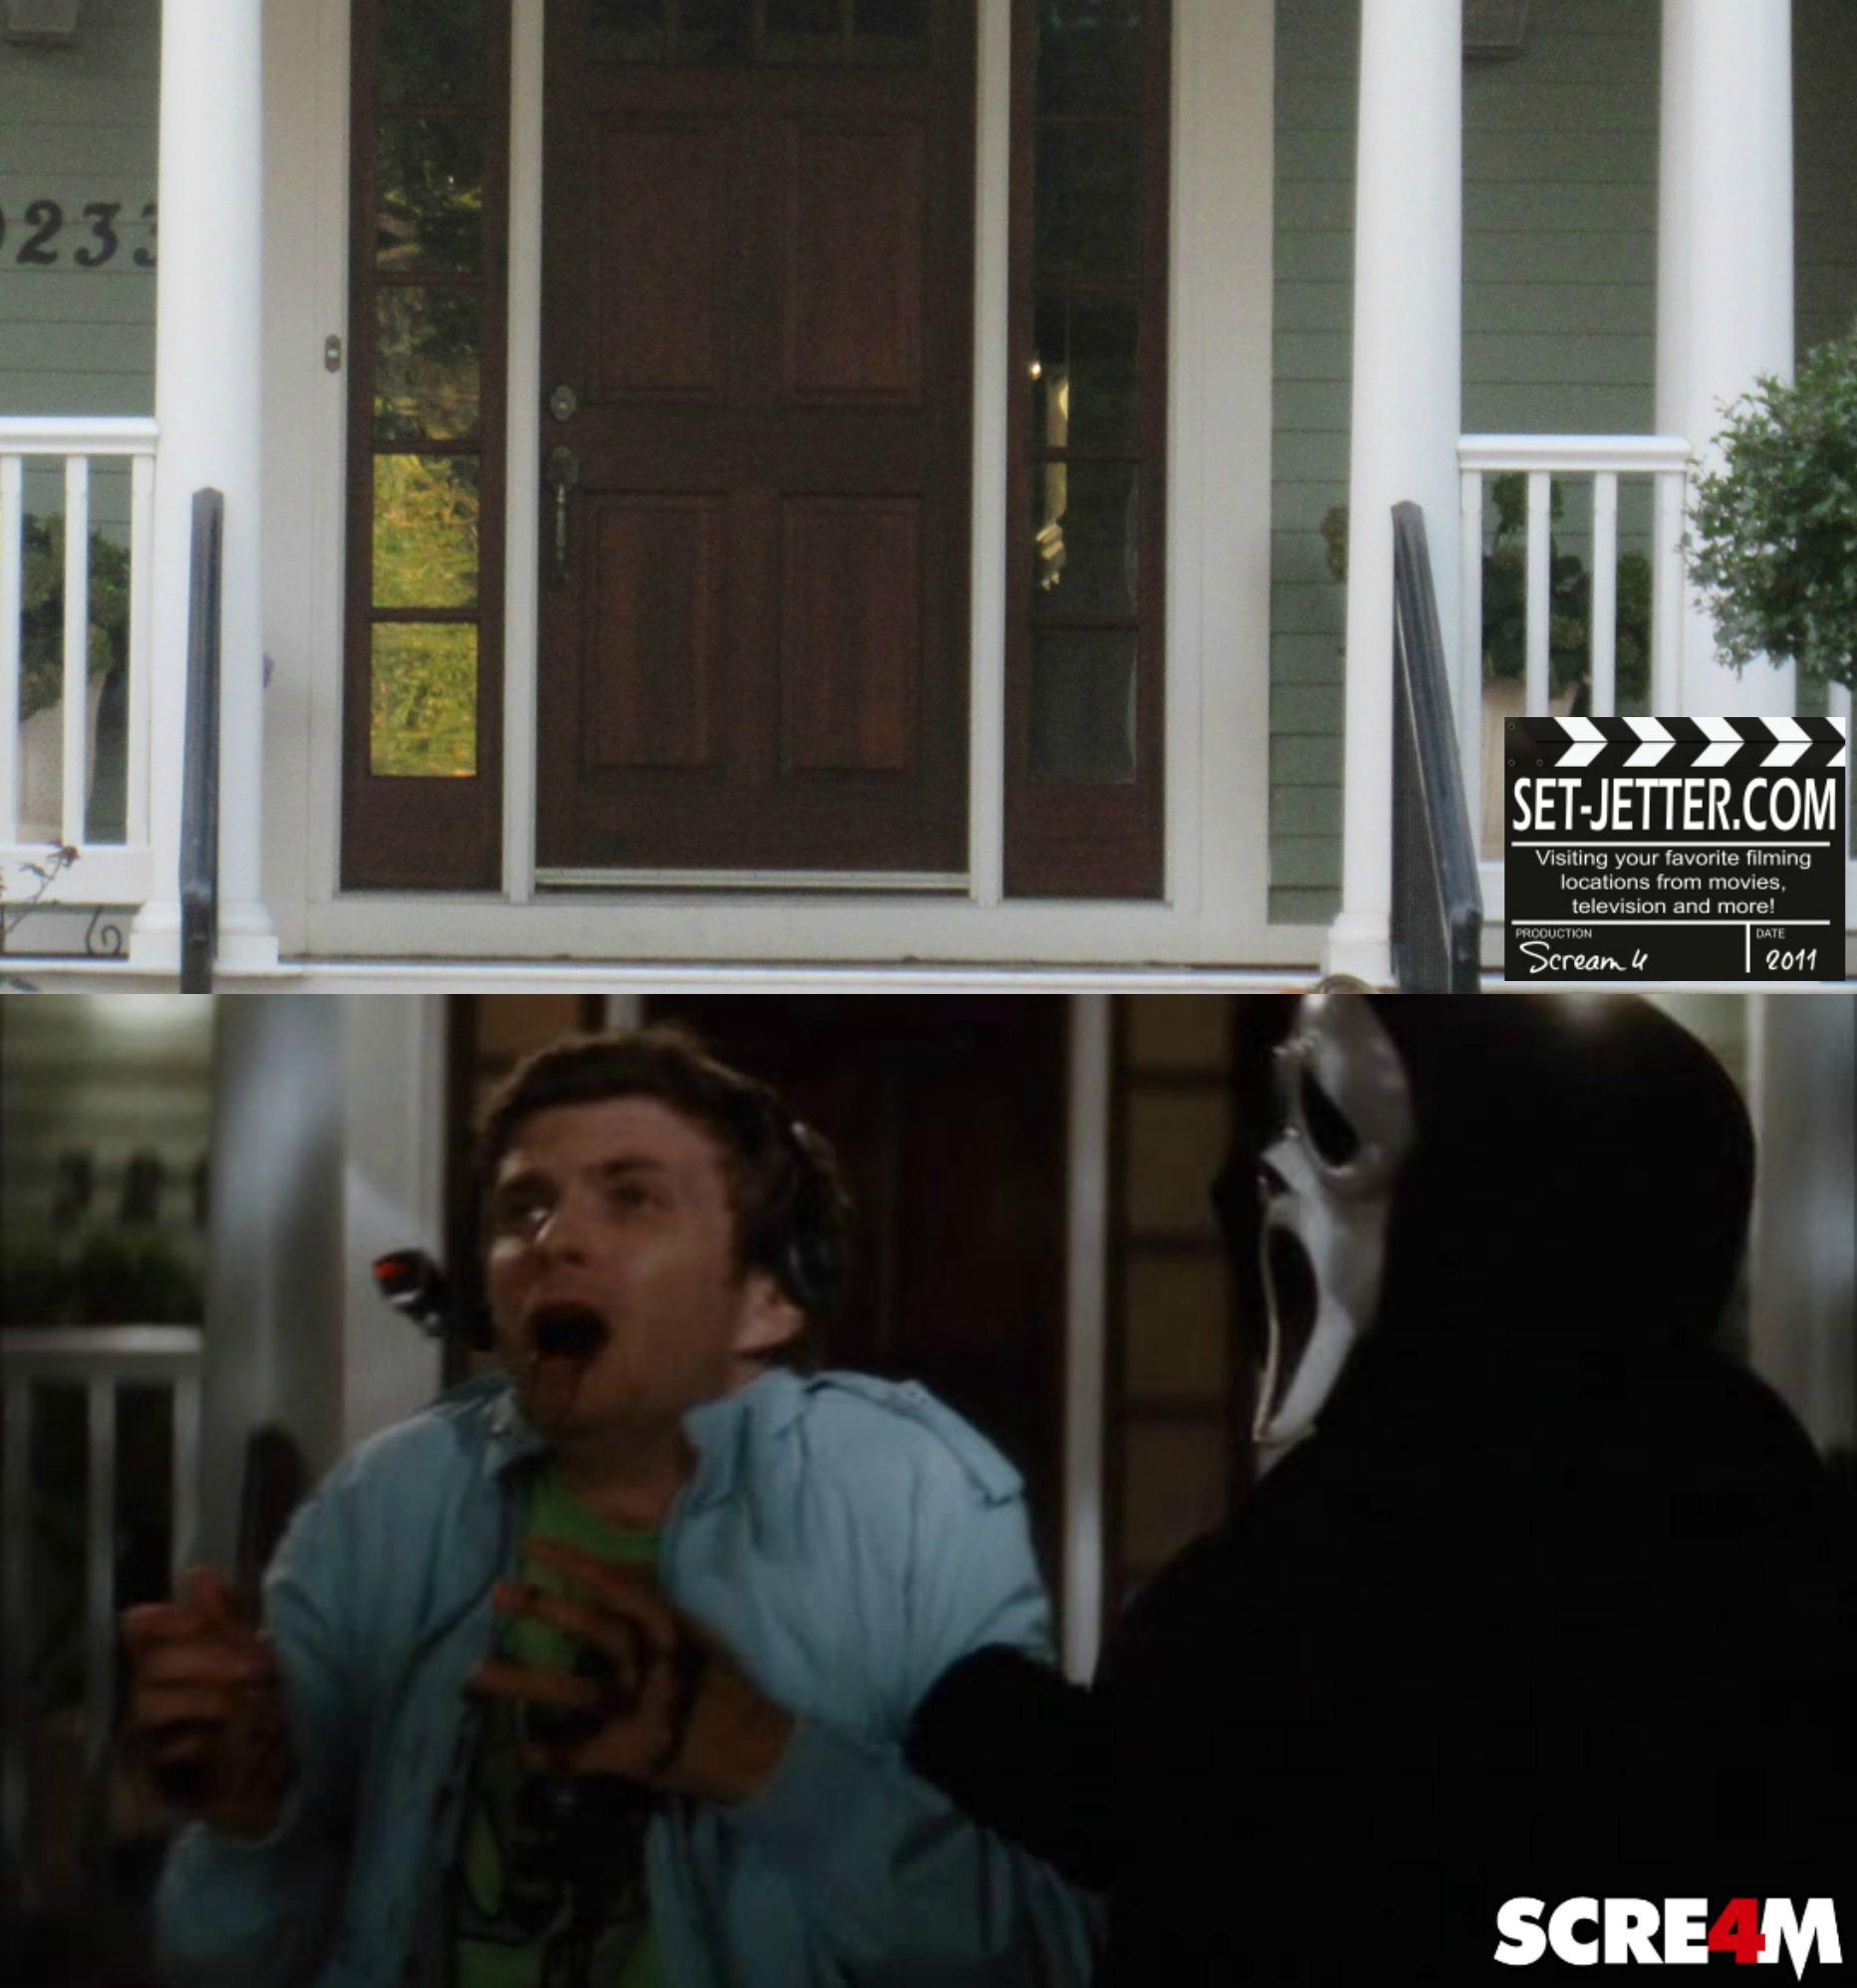 Scream4 comparison 143.jpg